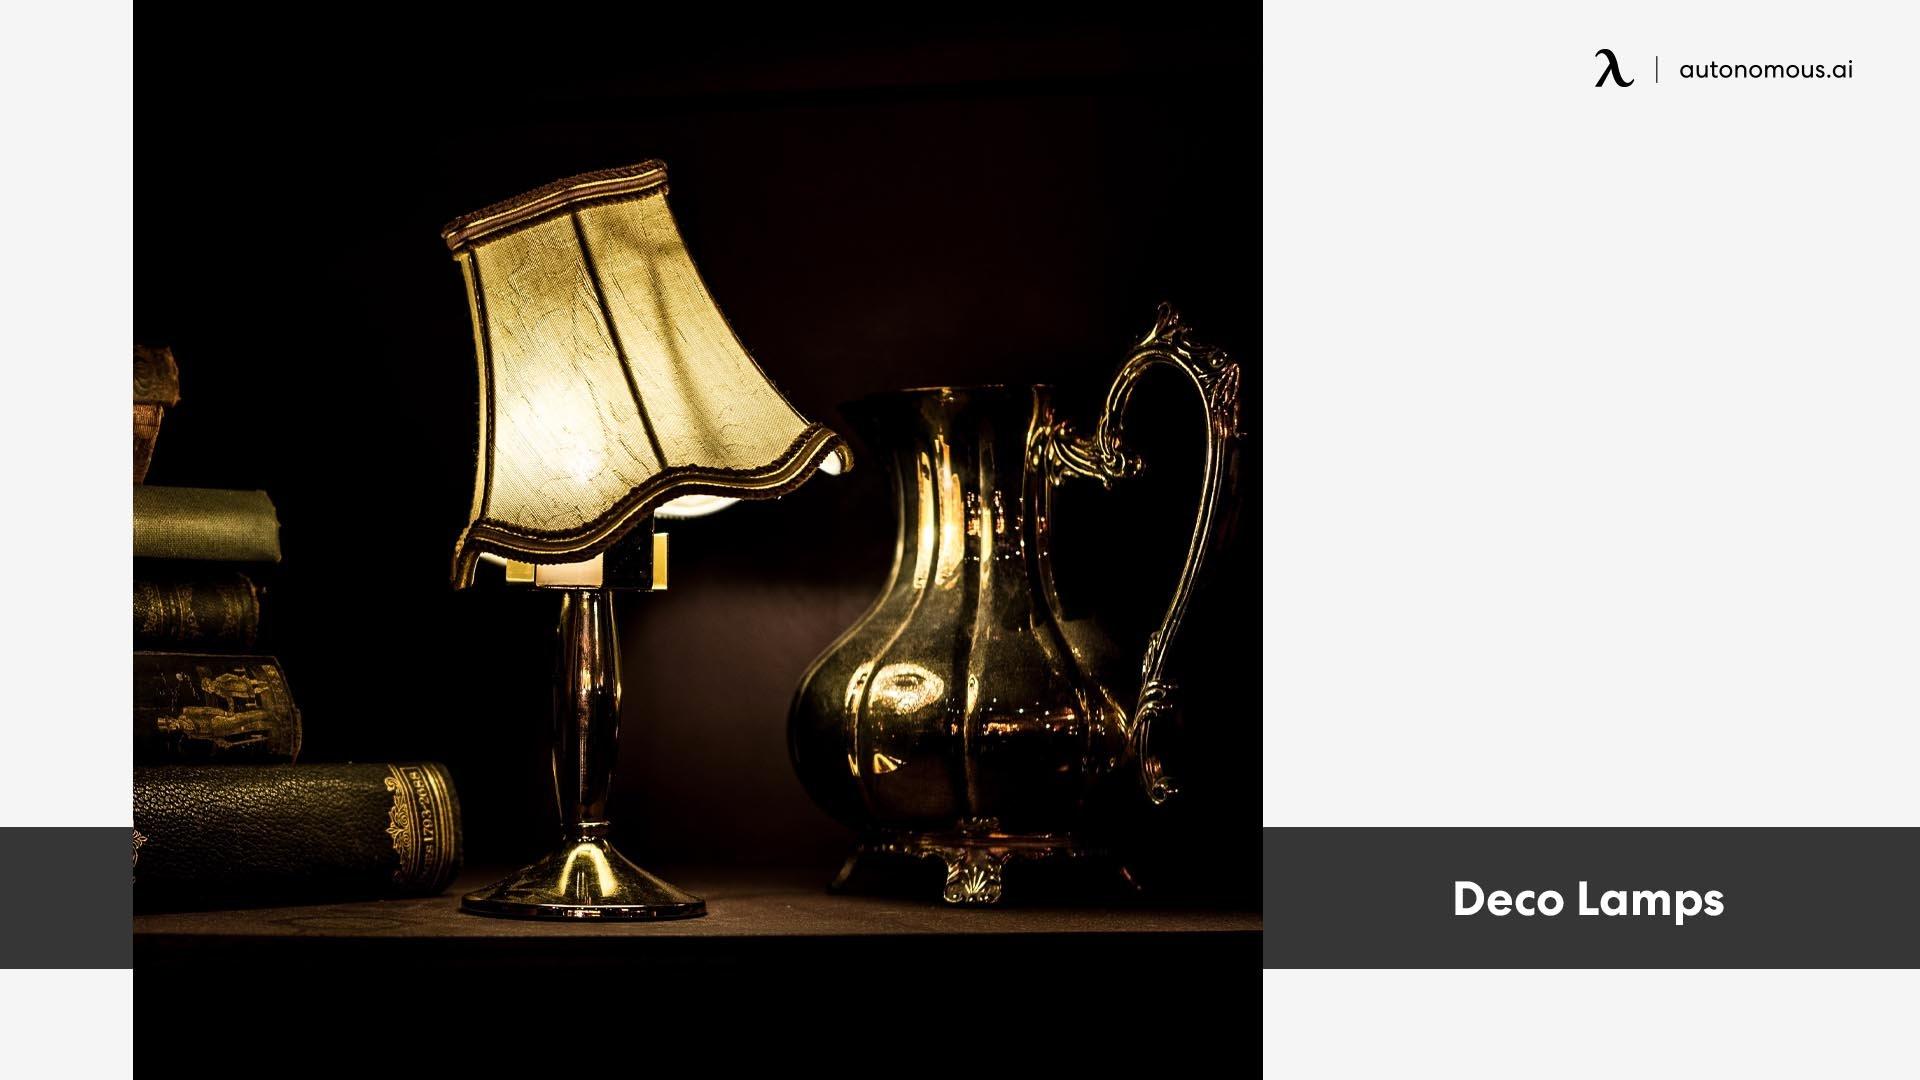 Photo of Deco Lamps